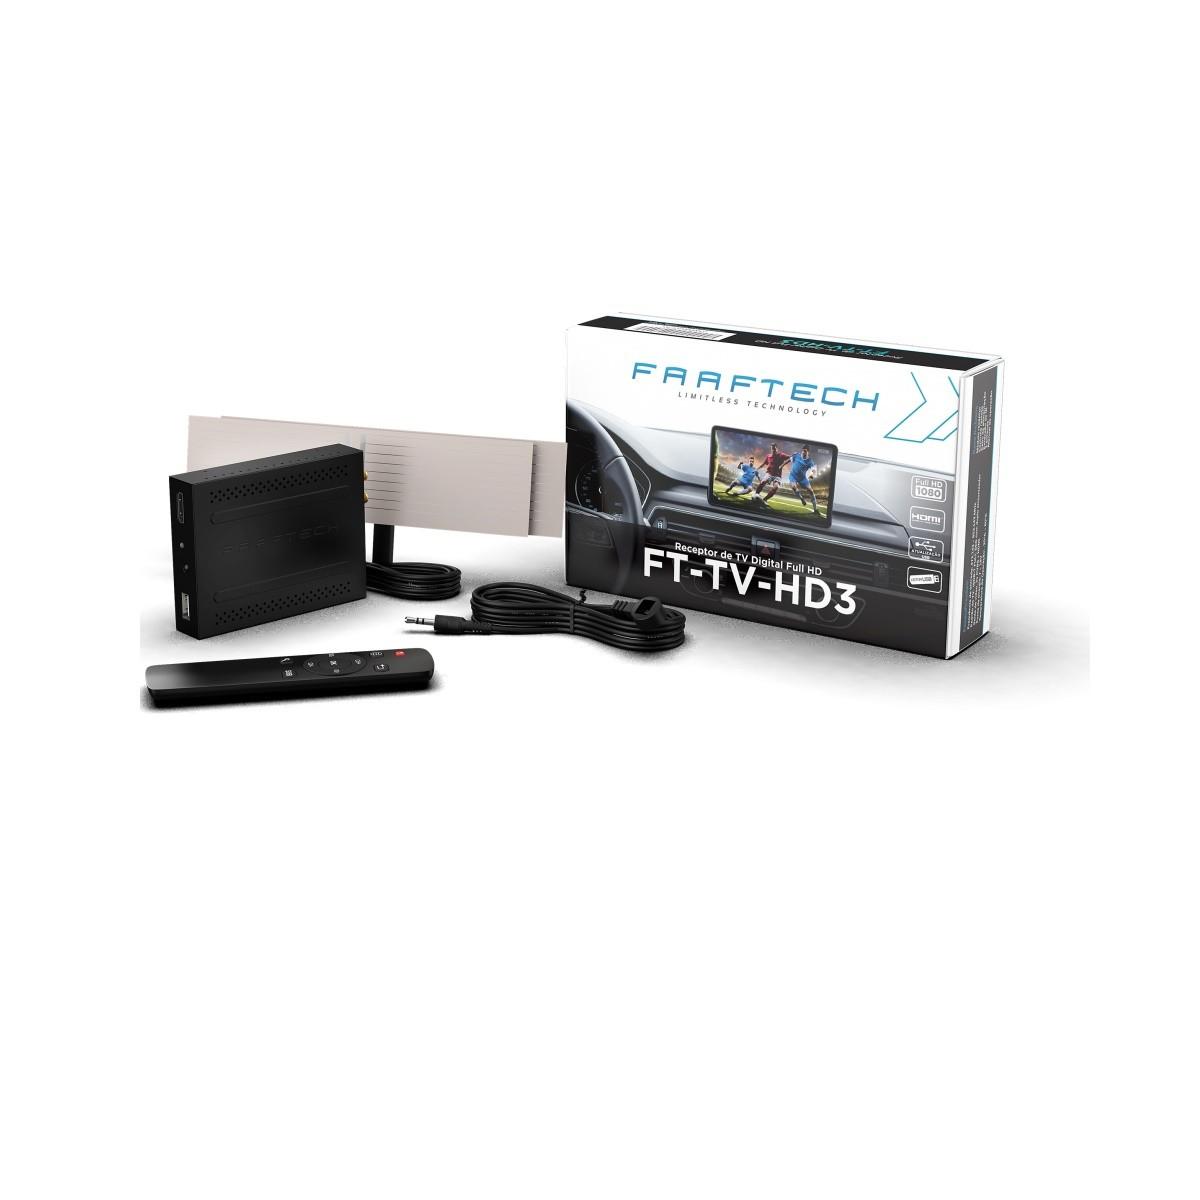 Receptor de TV Digital Automotivo Faaftech FT-TV-HD3 Full HD com Controle e HDMI